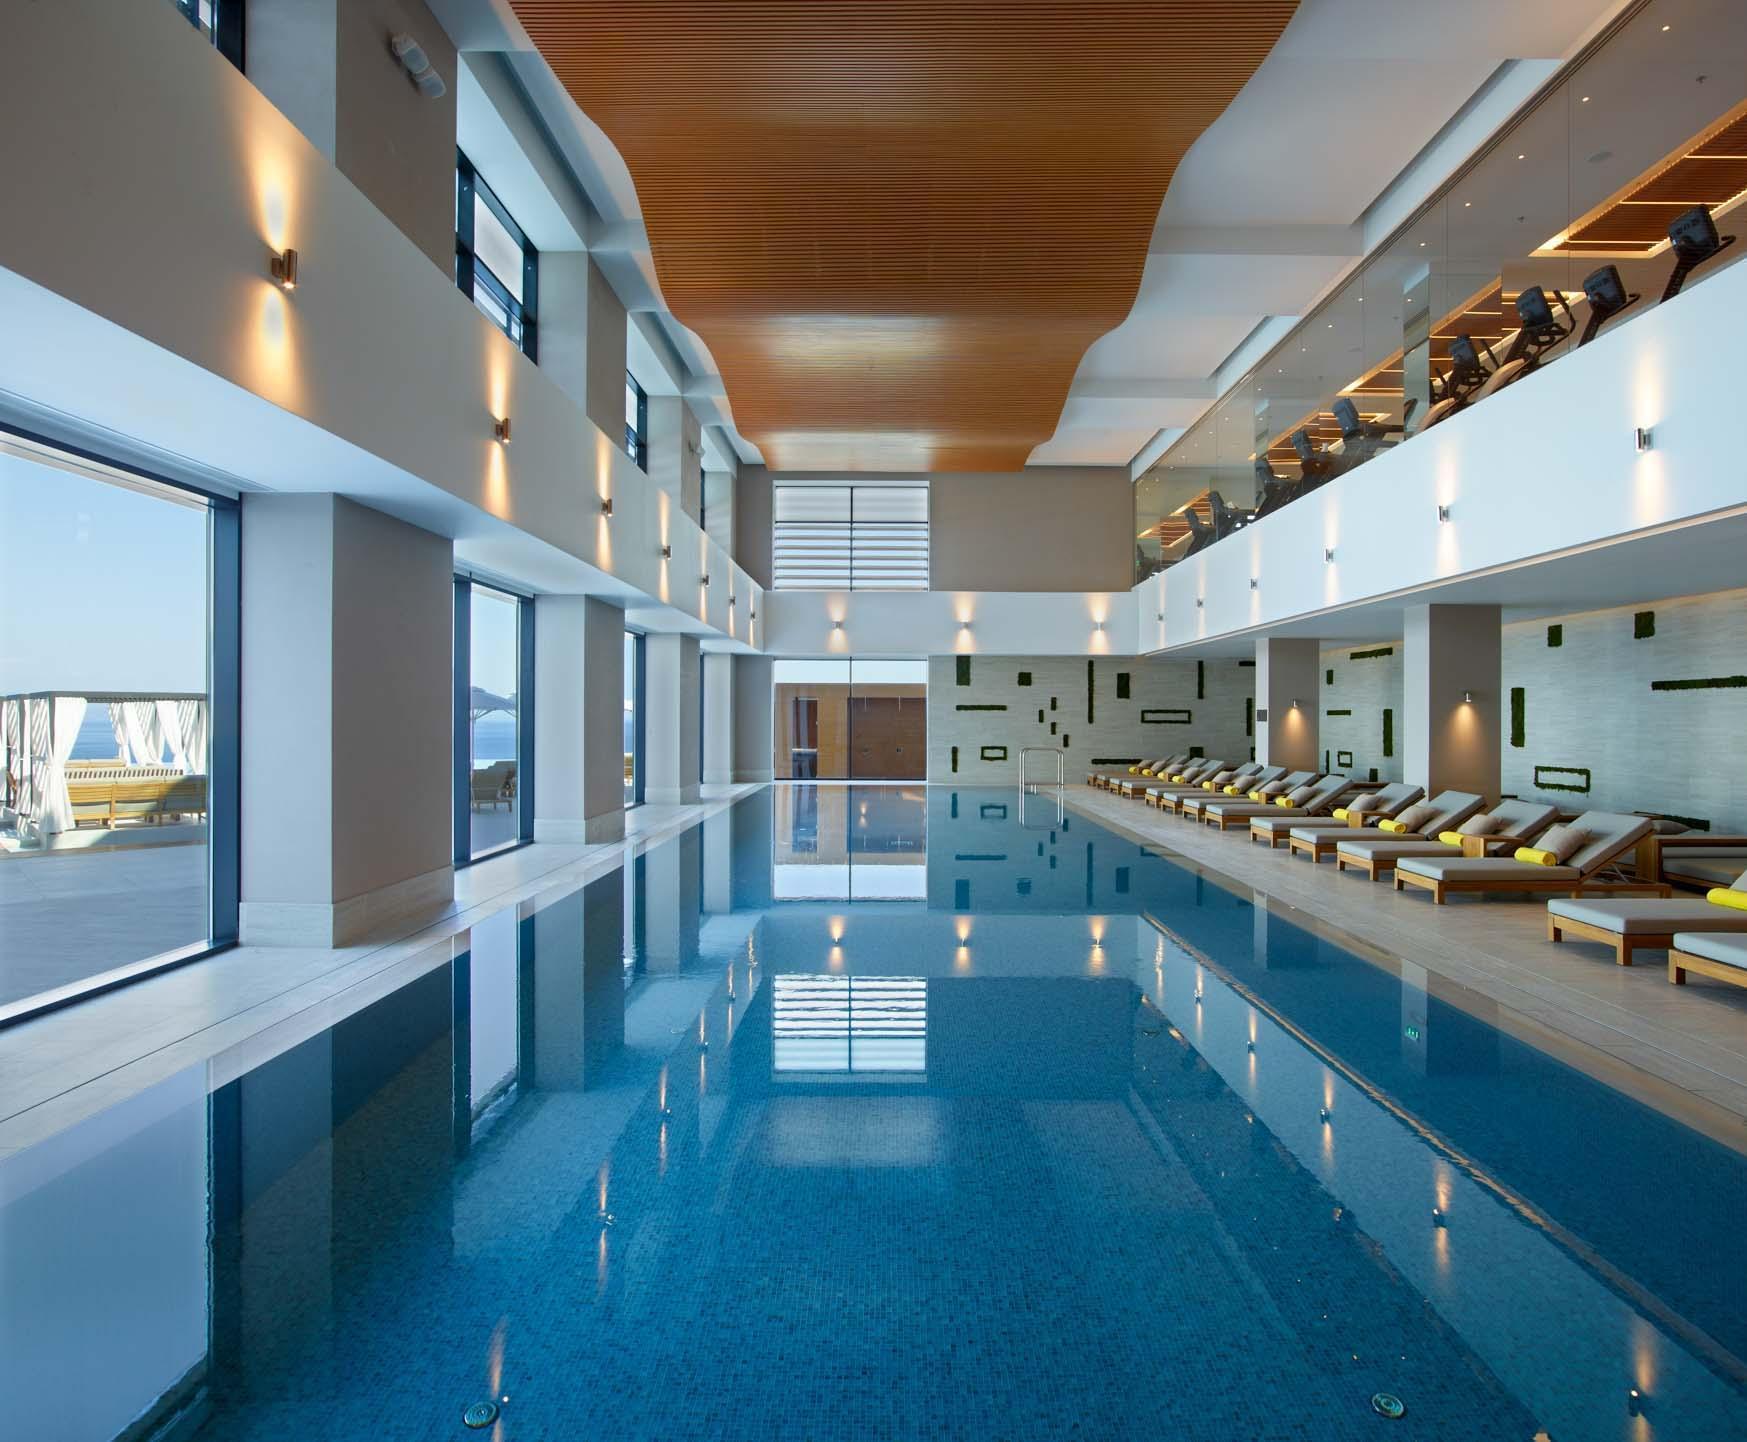 La piscine du spa © Angsana